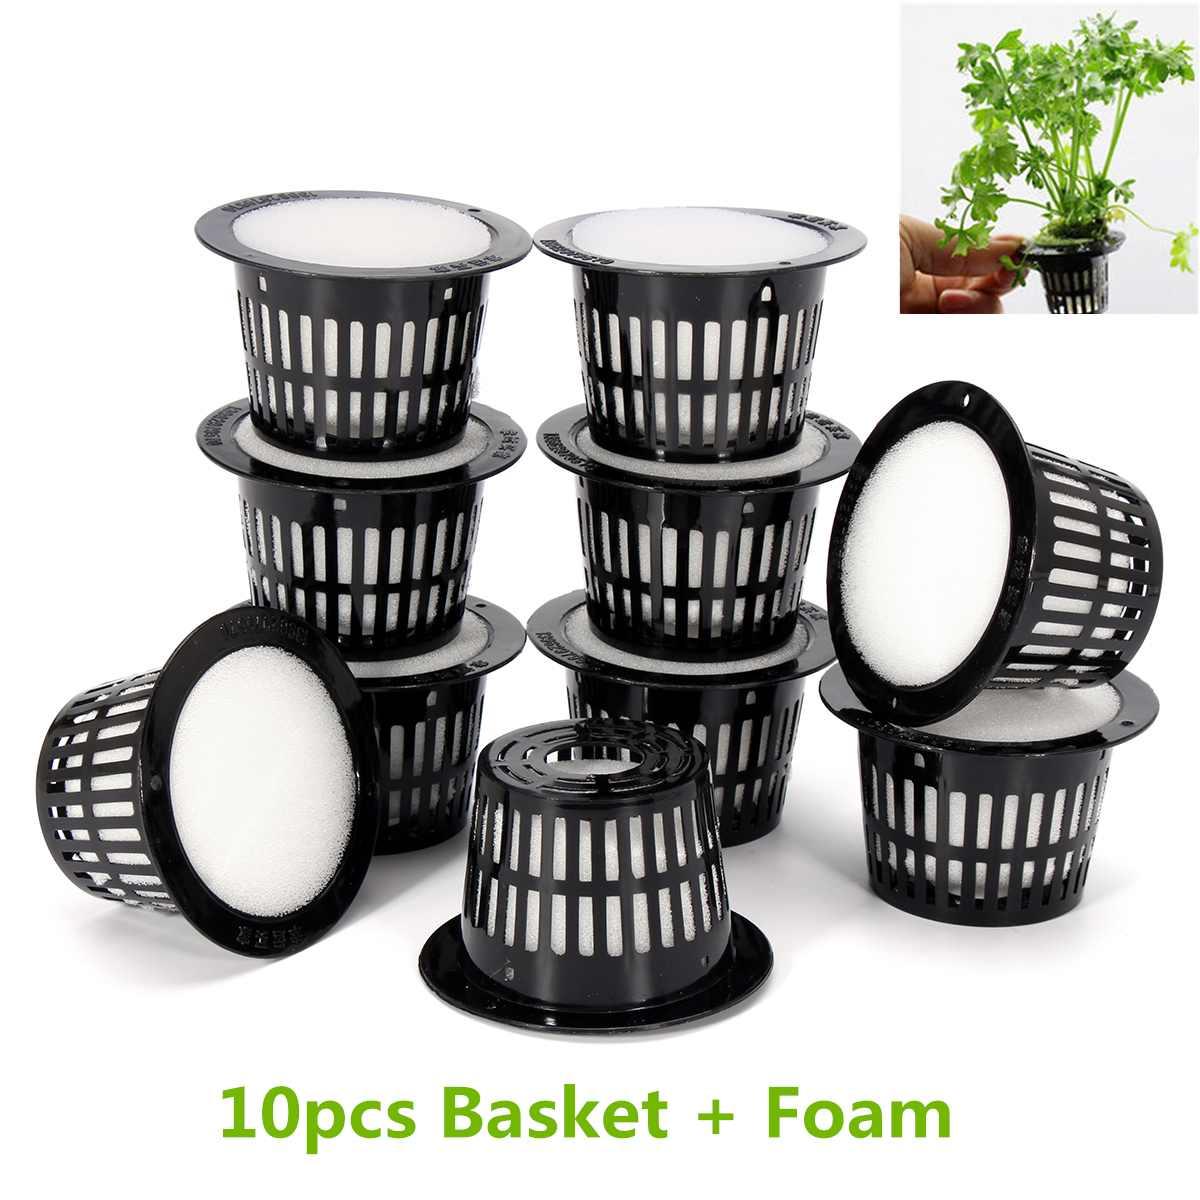 10Pcs Mesh Pot Net Cup Basket Hydroponic System Garden Plant Grow Vegetable Cloning Foam Seed Germinate Nursery Pots 2 Size